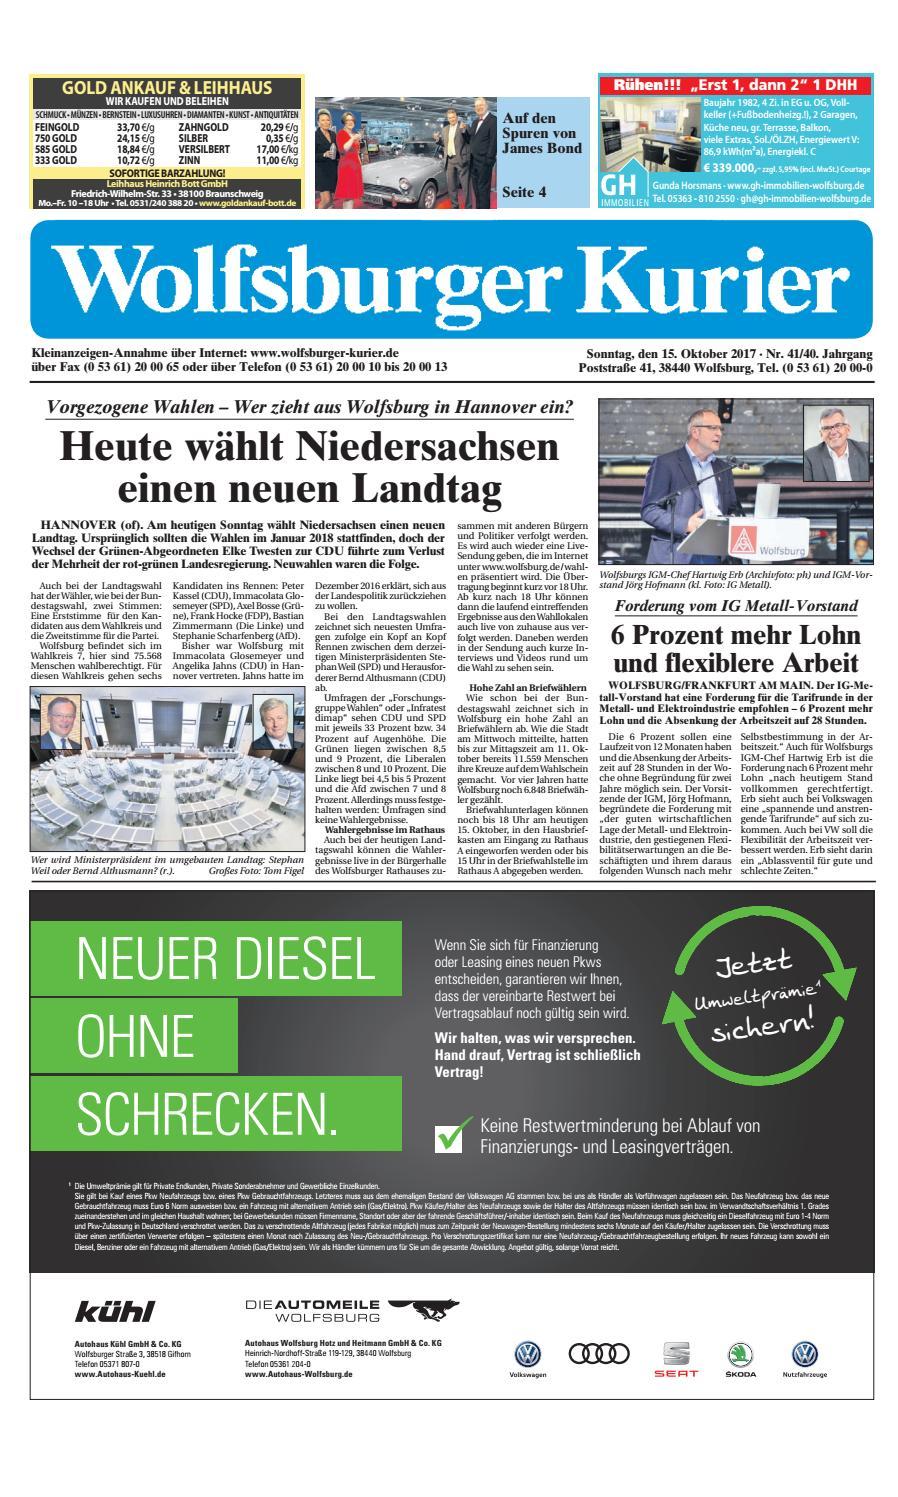 2017 10 15 by Wolfsburger Kurier - issuu